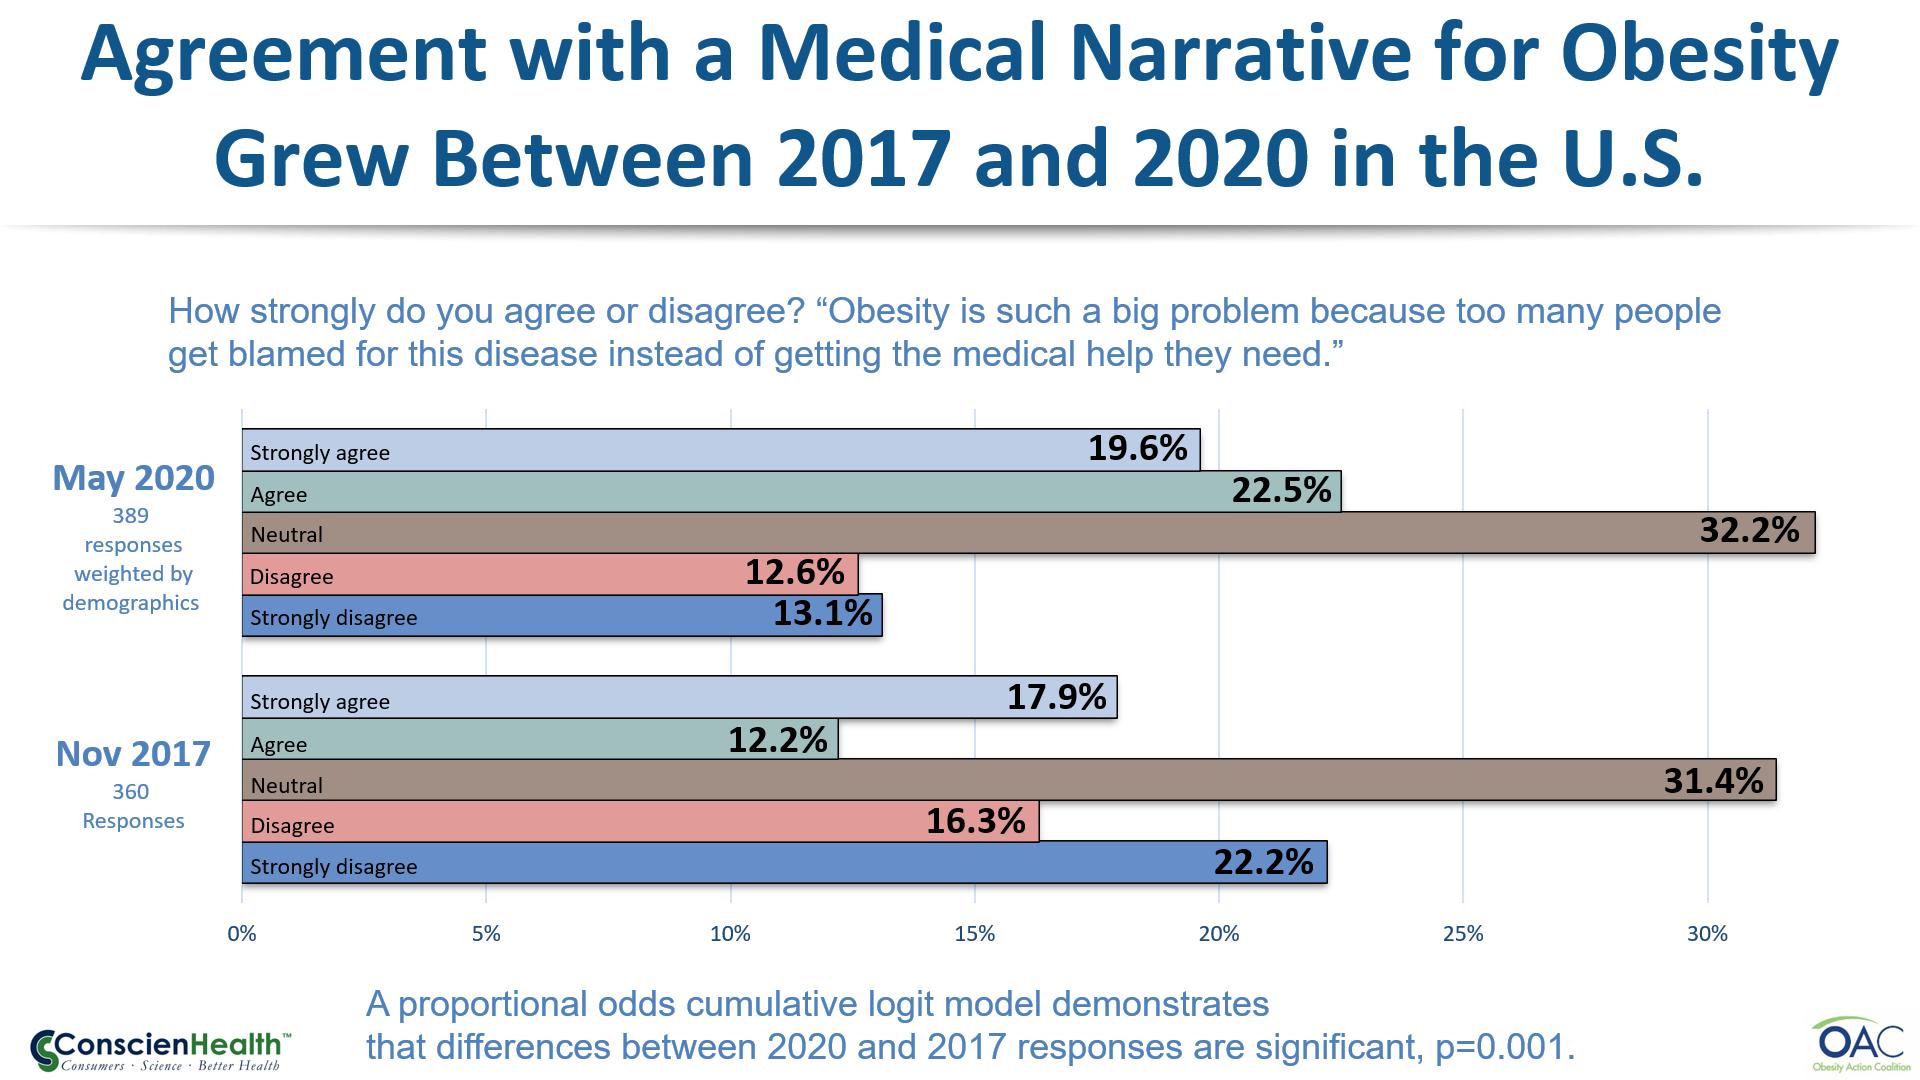 Figure 2: Medical Narrative for Obesity